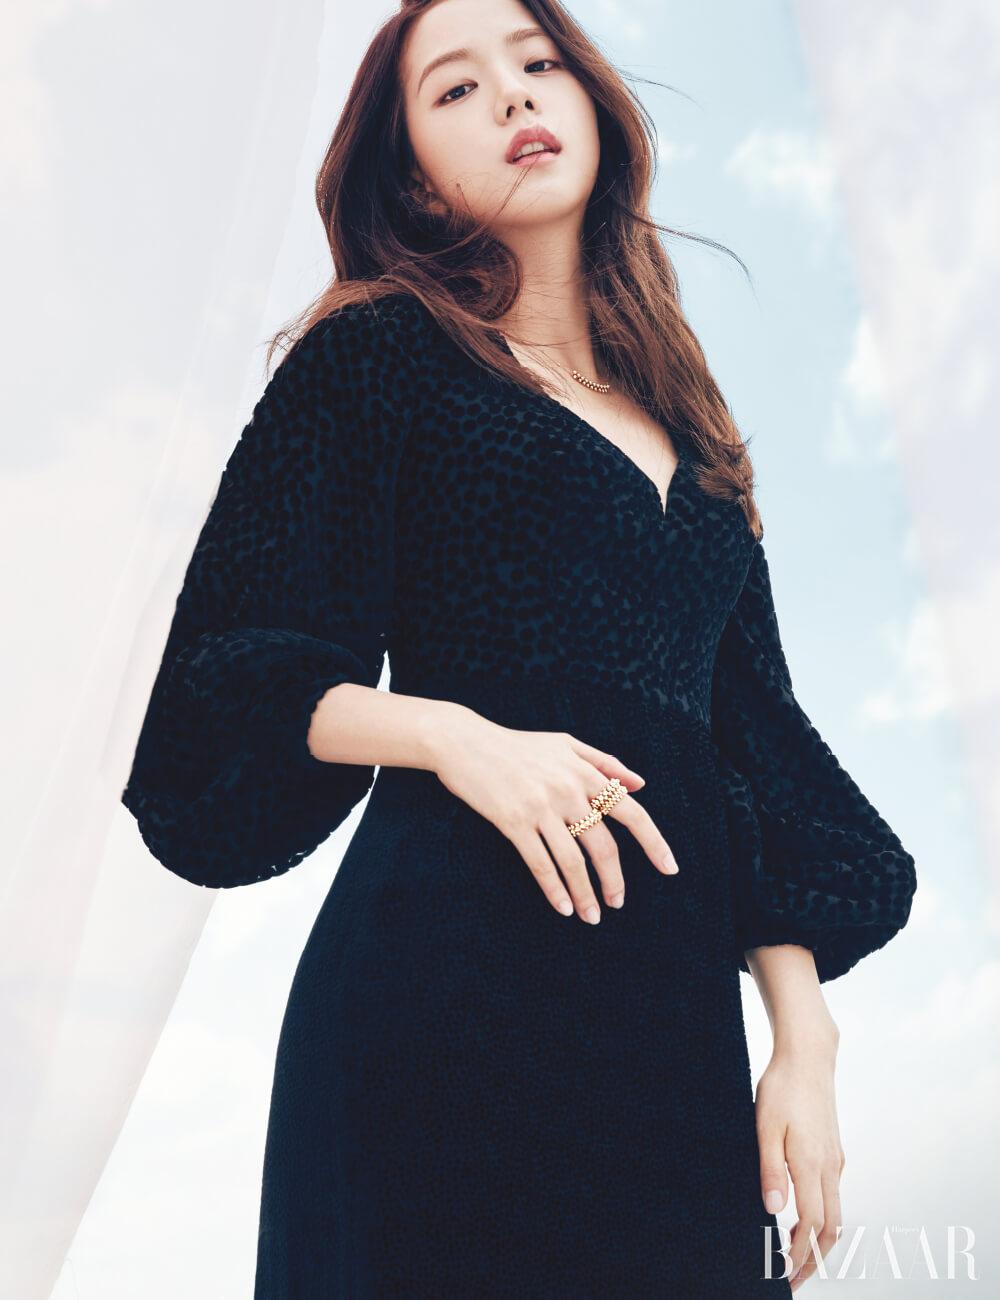 18K 핑크 골드 소재 목걸이, 검지와 중지에 착용한 반지는 모두 '클래쉬 드 까르띠에' 컬렉션 Cartier. 드레스는 Escada Vintage Gown.